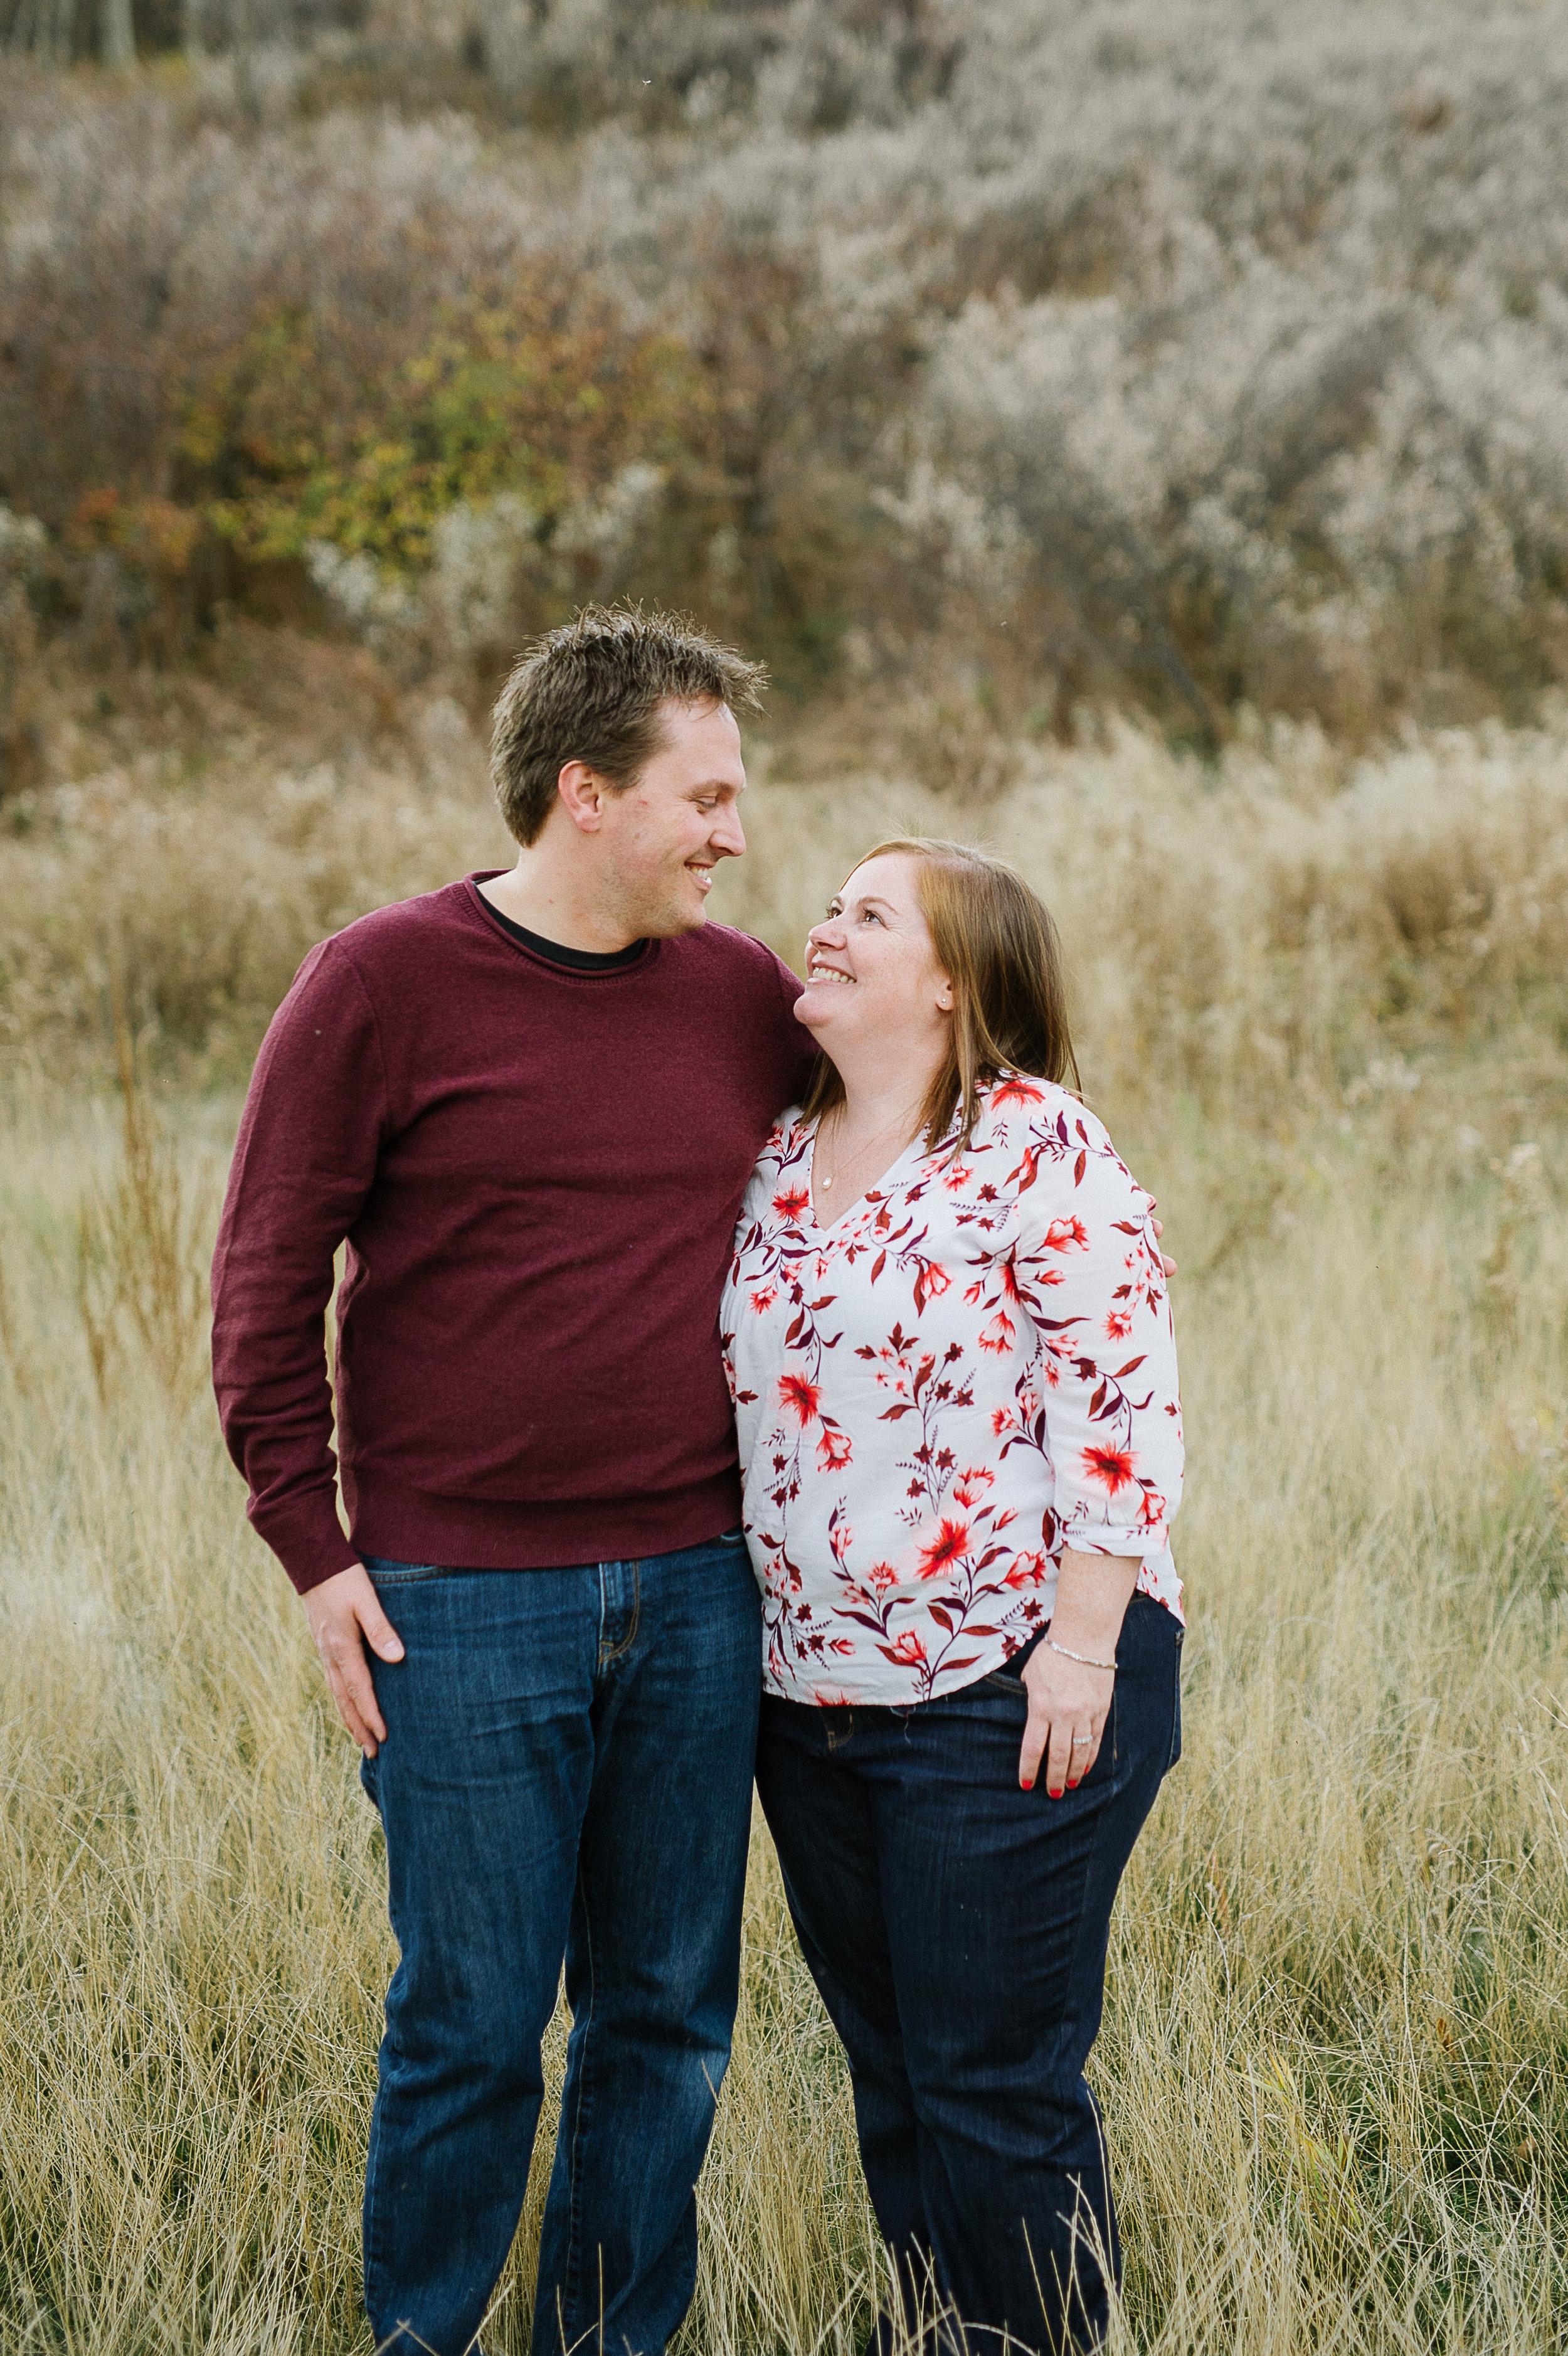 Calgary_Wedding_Photography_Amanda_Marc_Engagements_2017_HR 0032.jpg